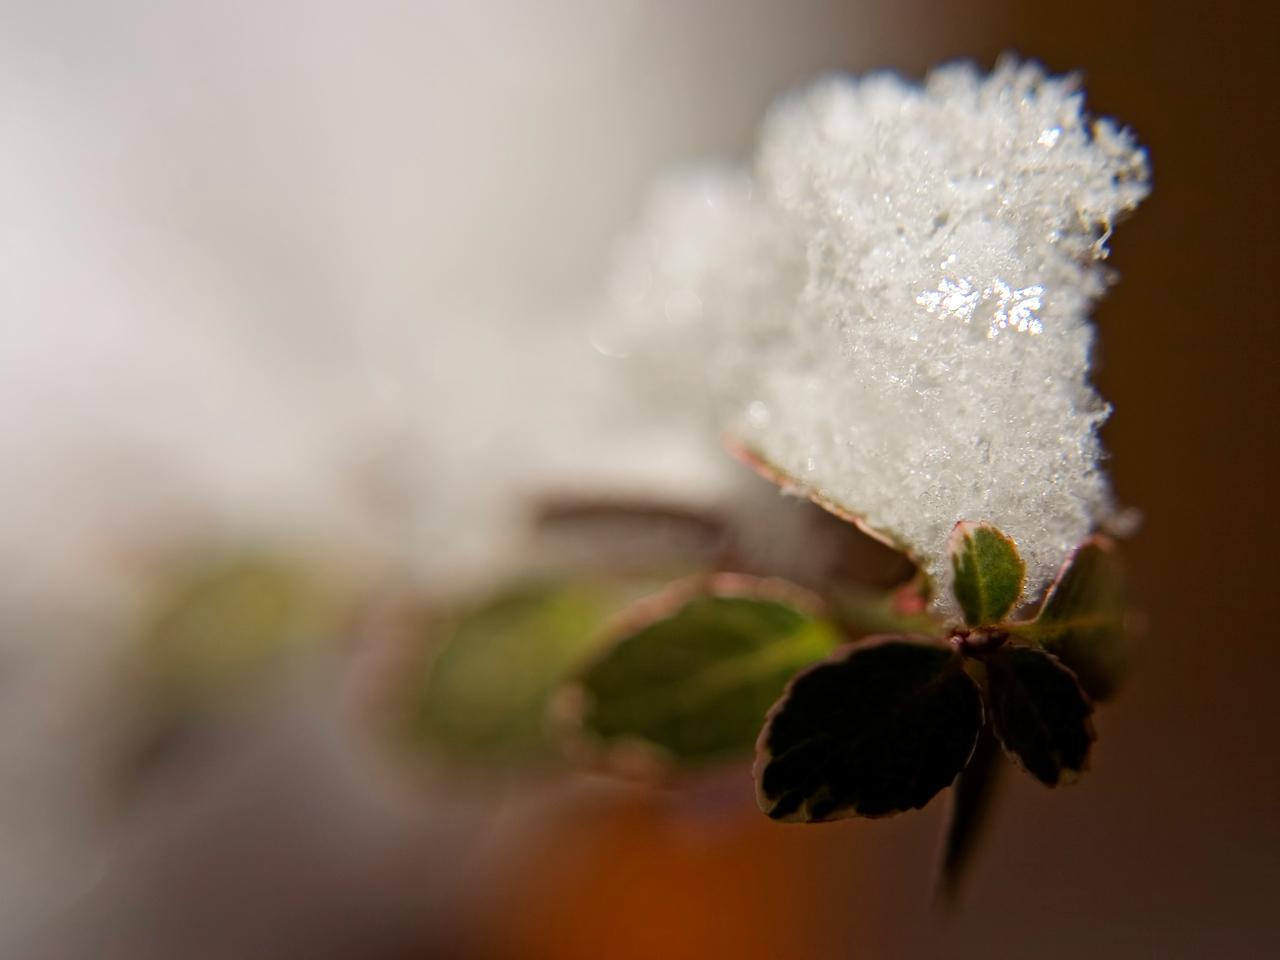 December 25 - Snowflakes